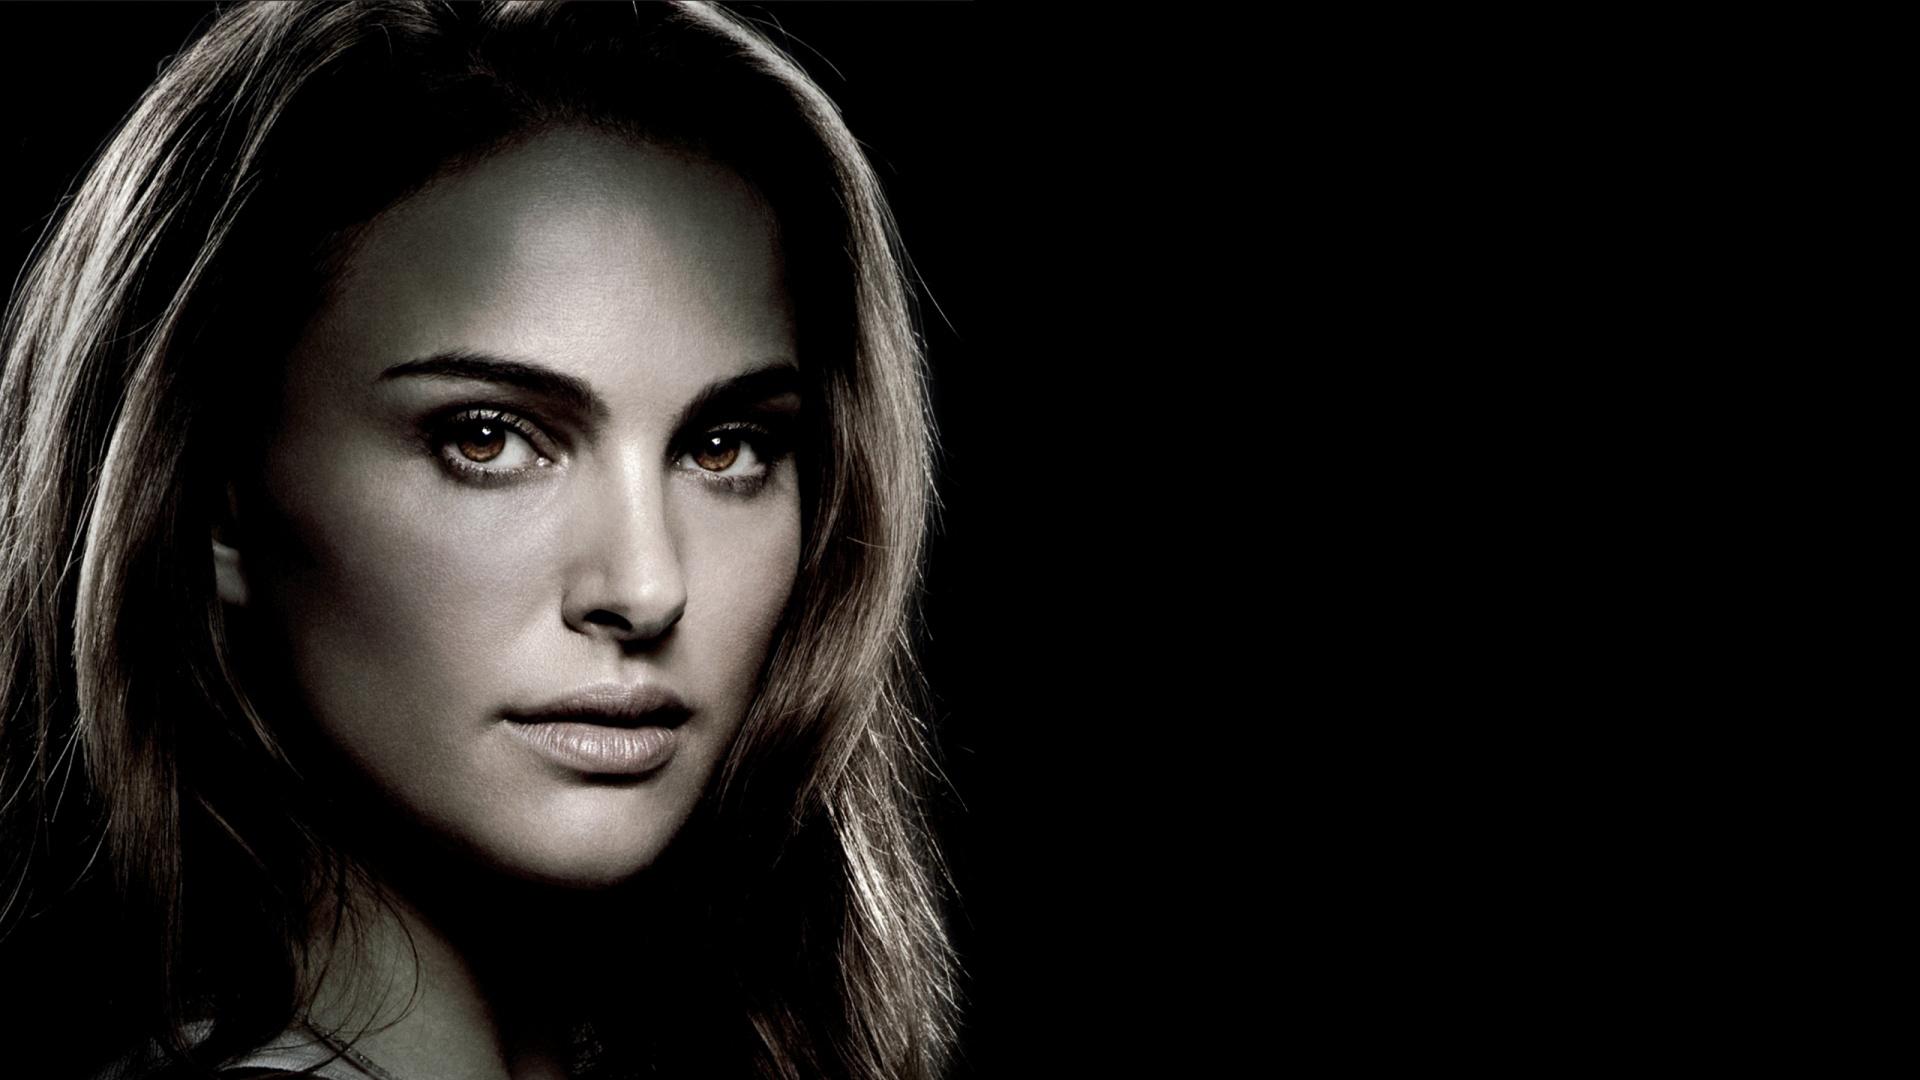 Natalie Portman Wallpapers HD